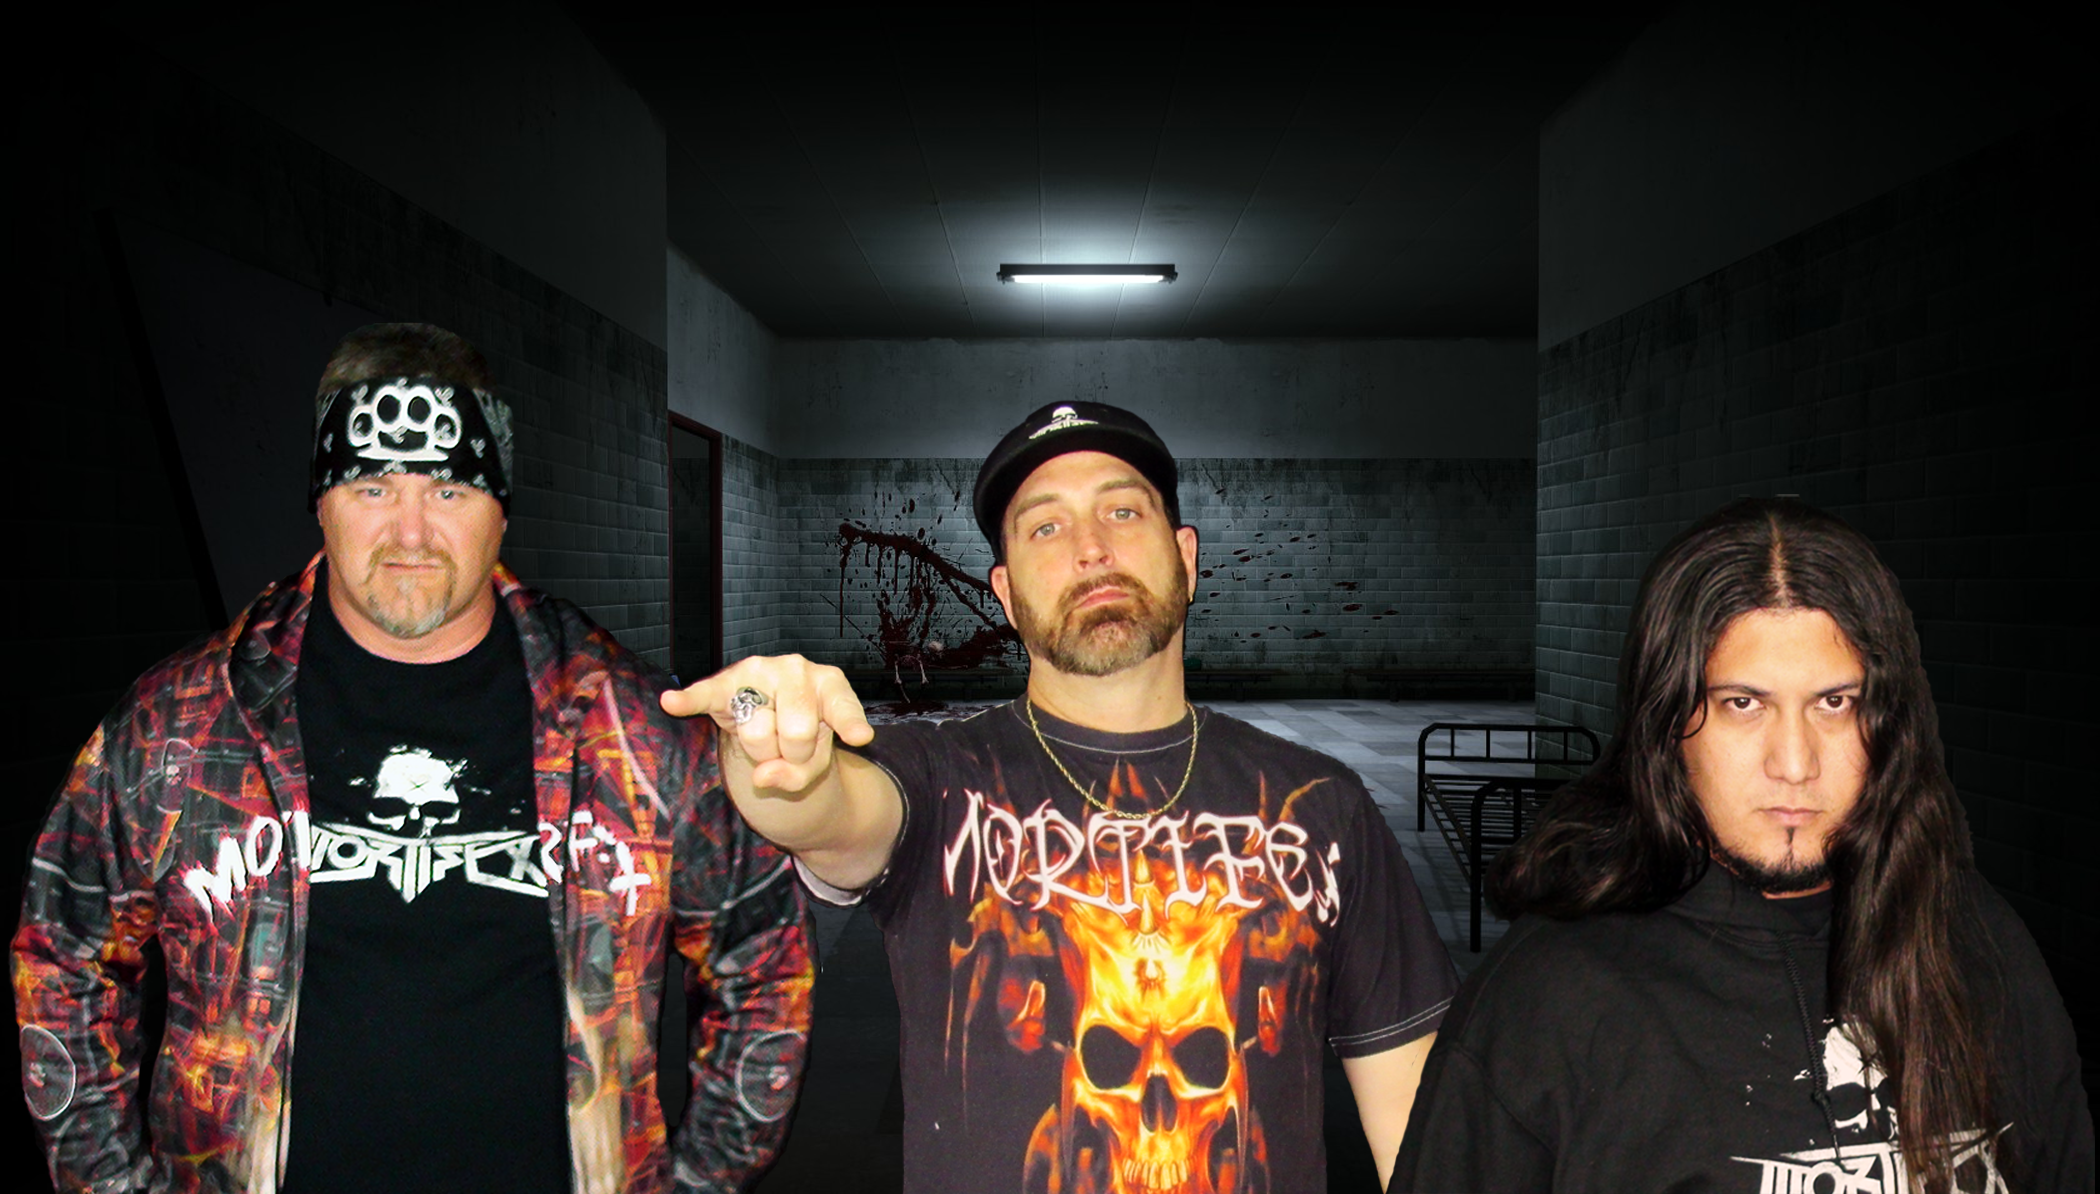 Mortifex-band-pic-D-no-logo